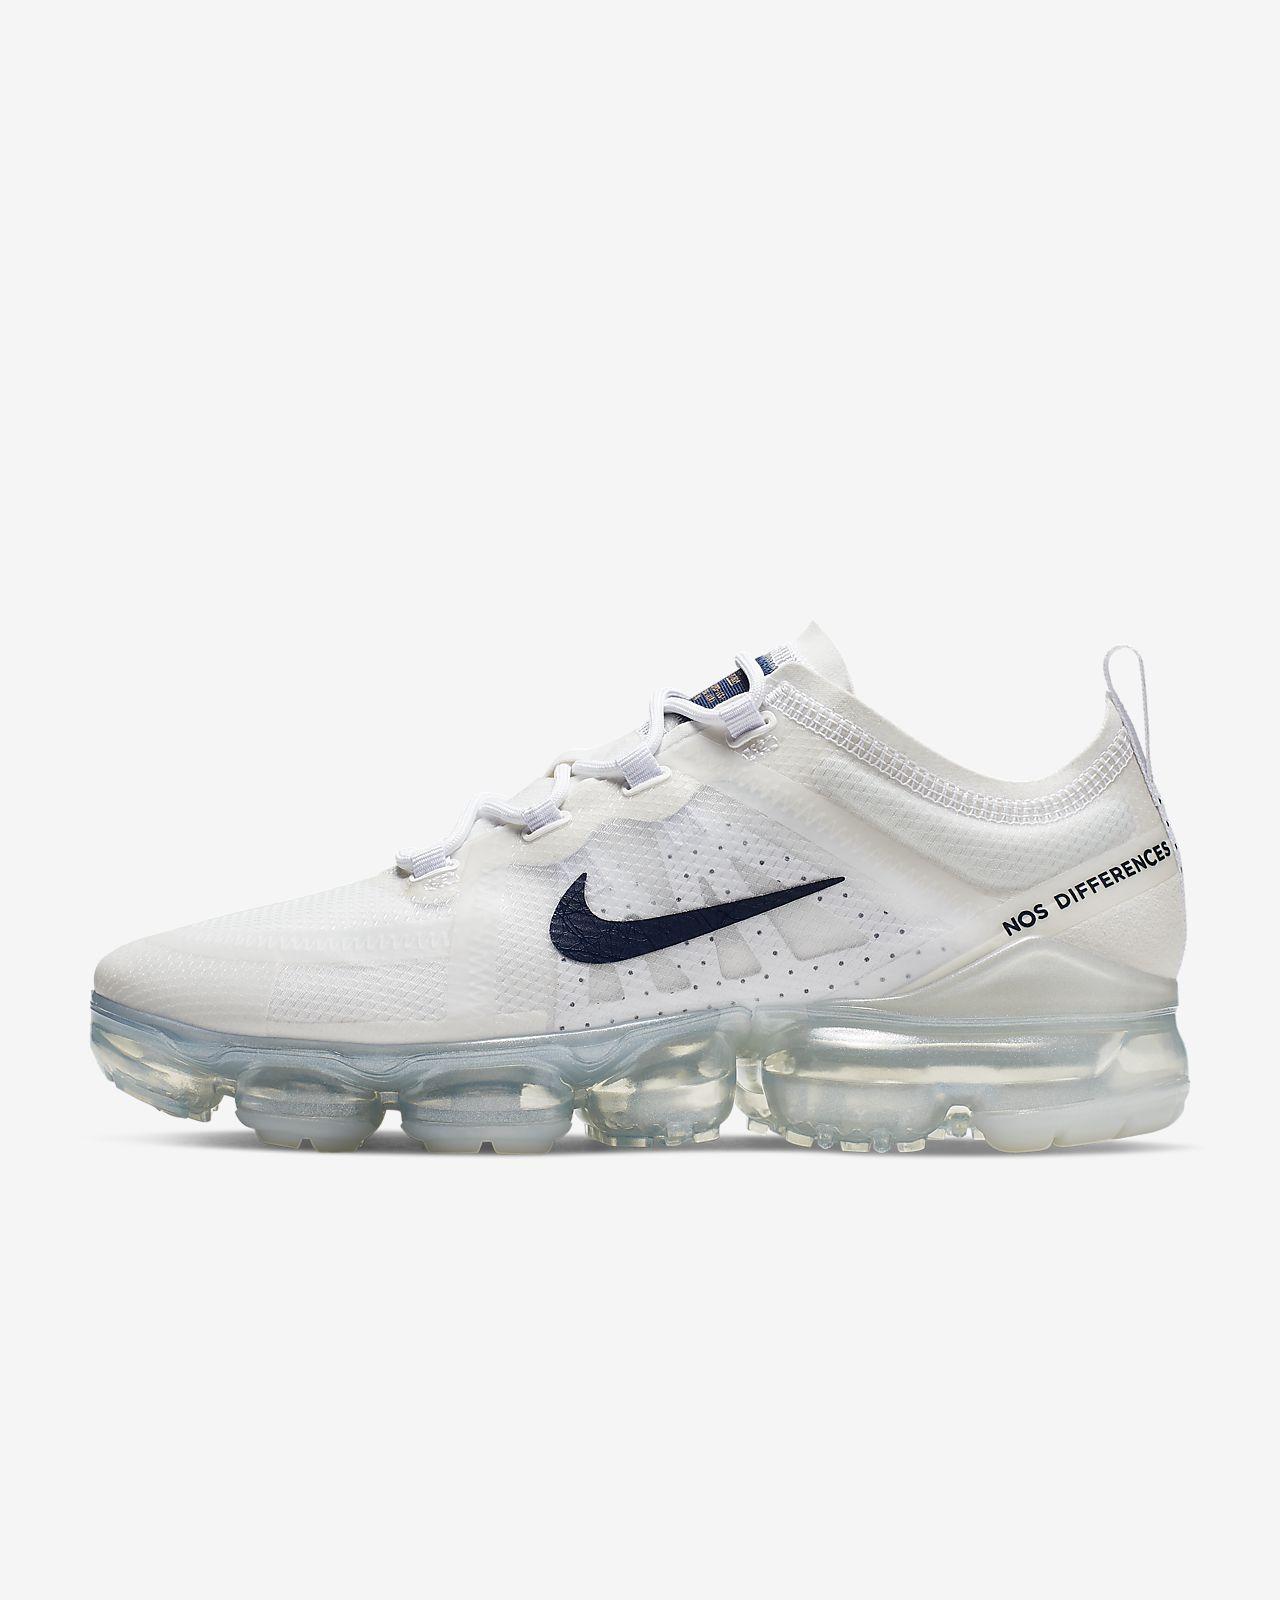 Dámská bota Nike Air VaporMax 2019 Unité Totale